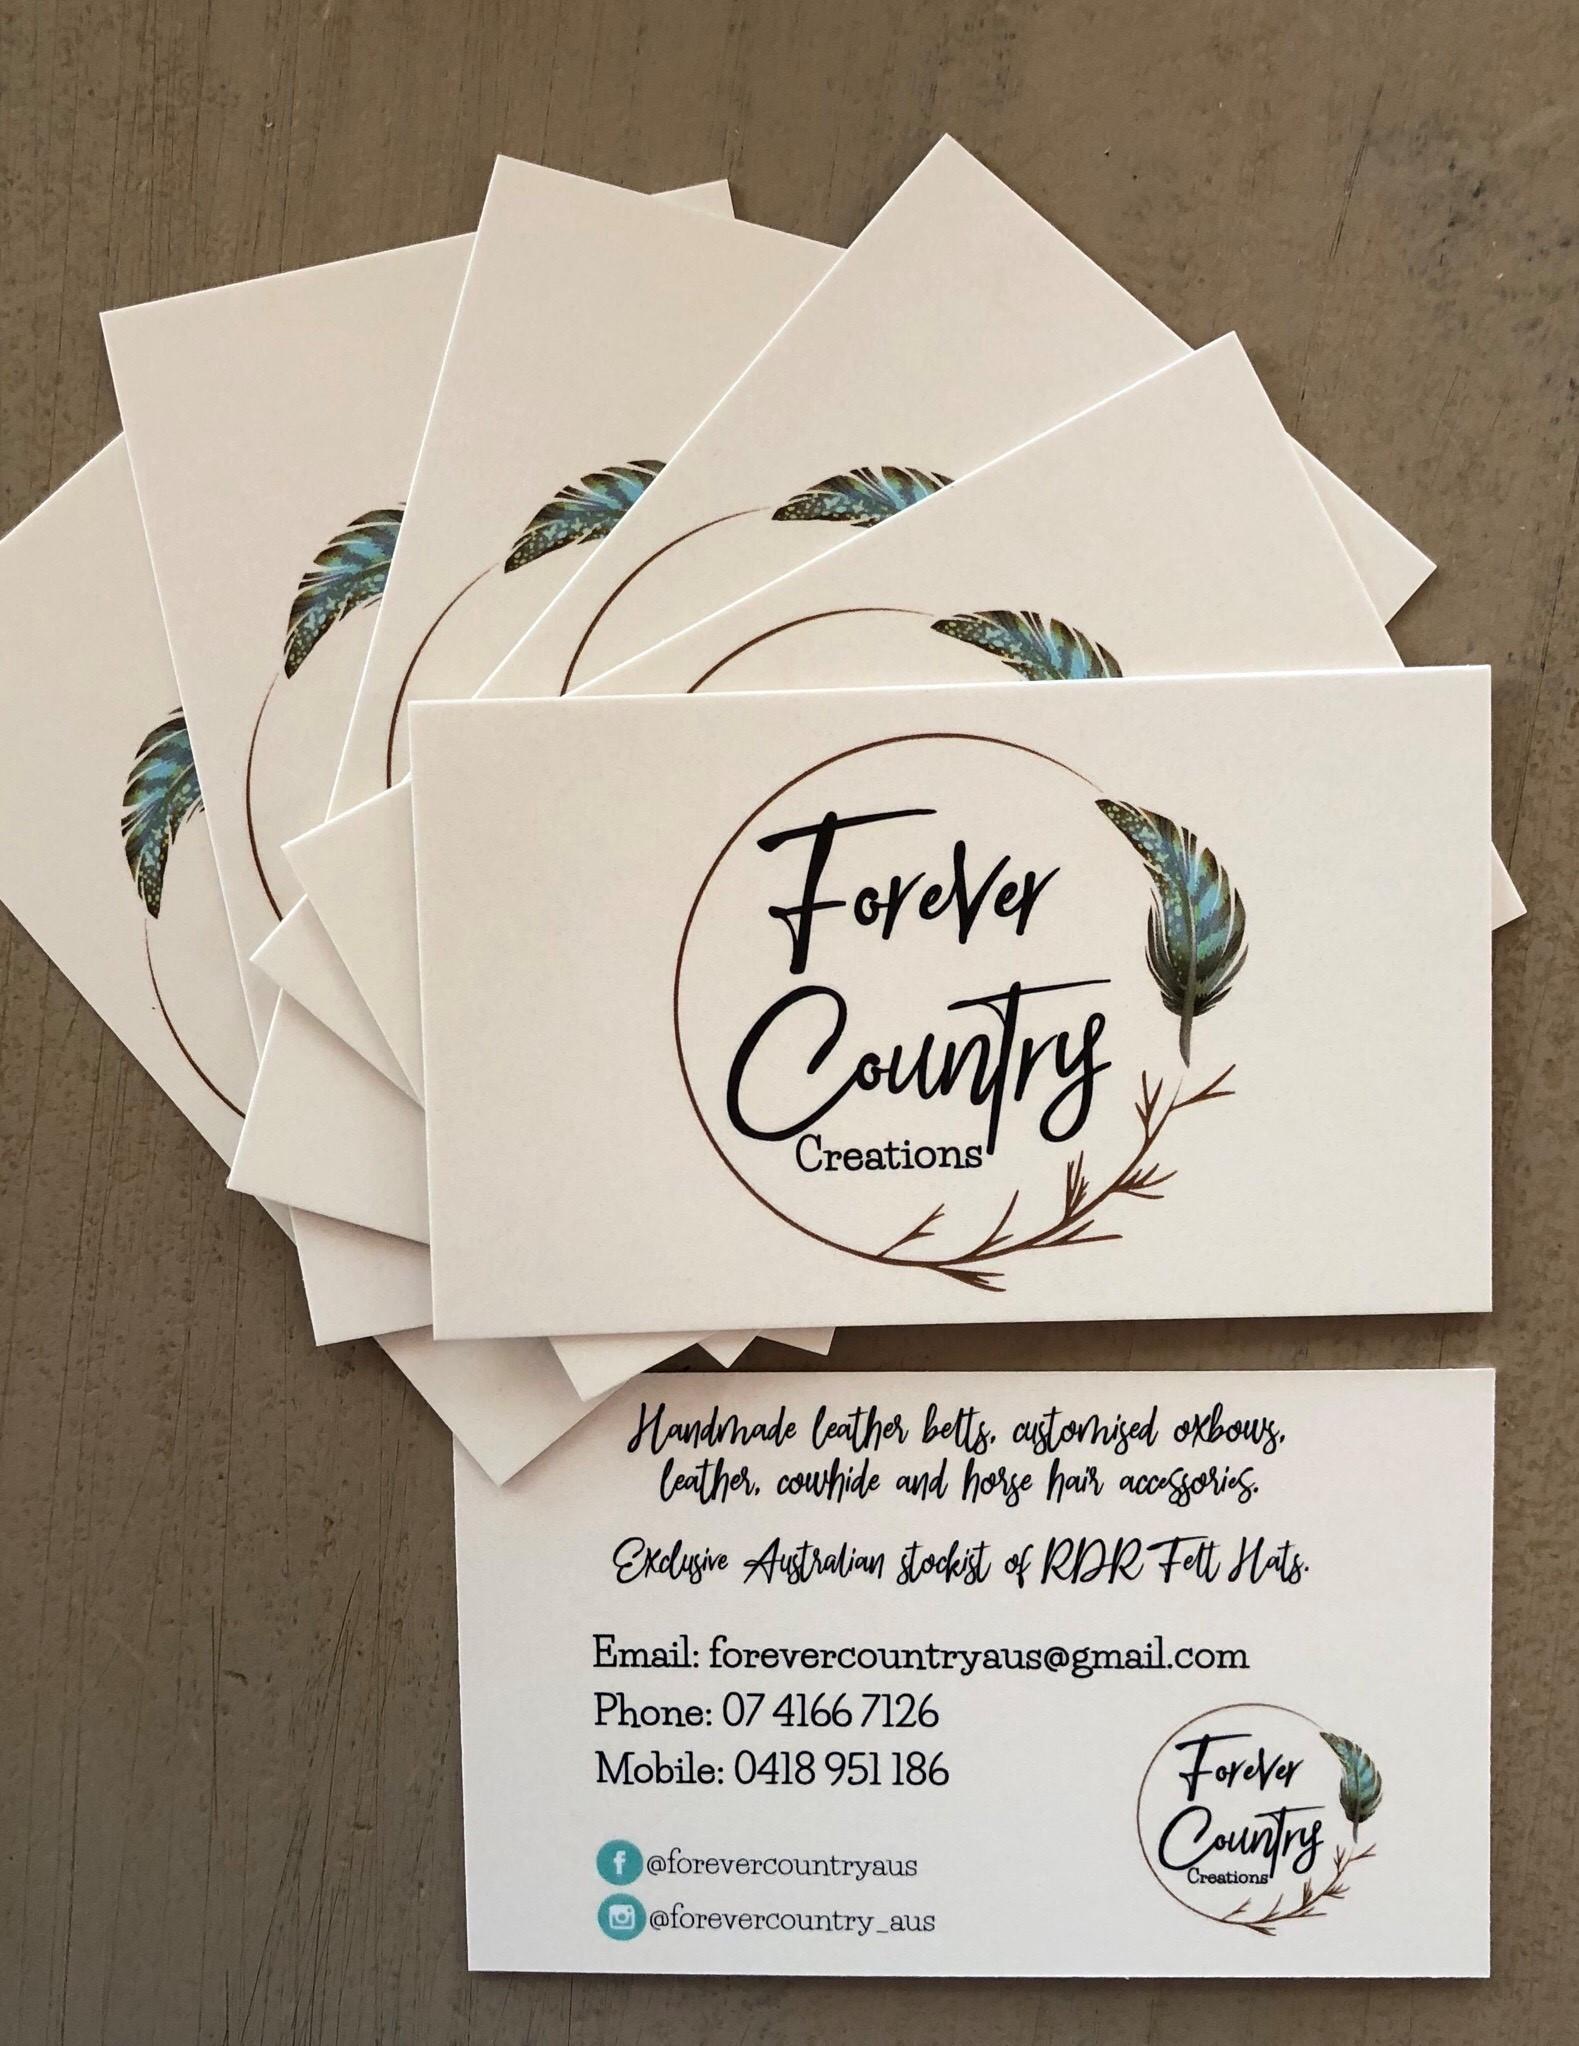 FCC Business cards